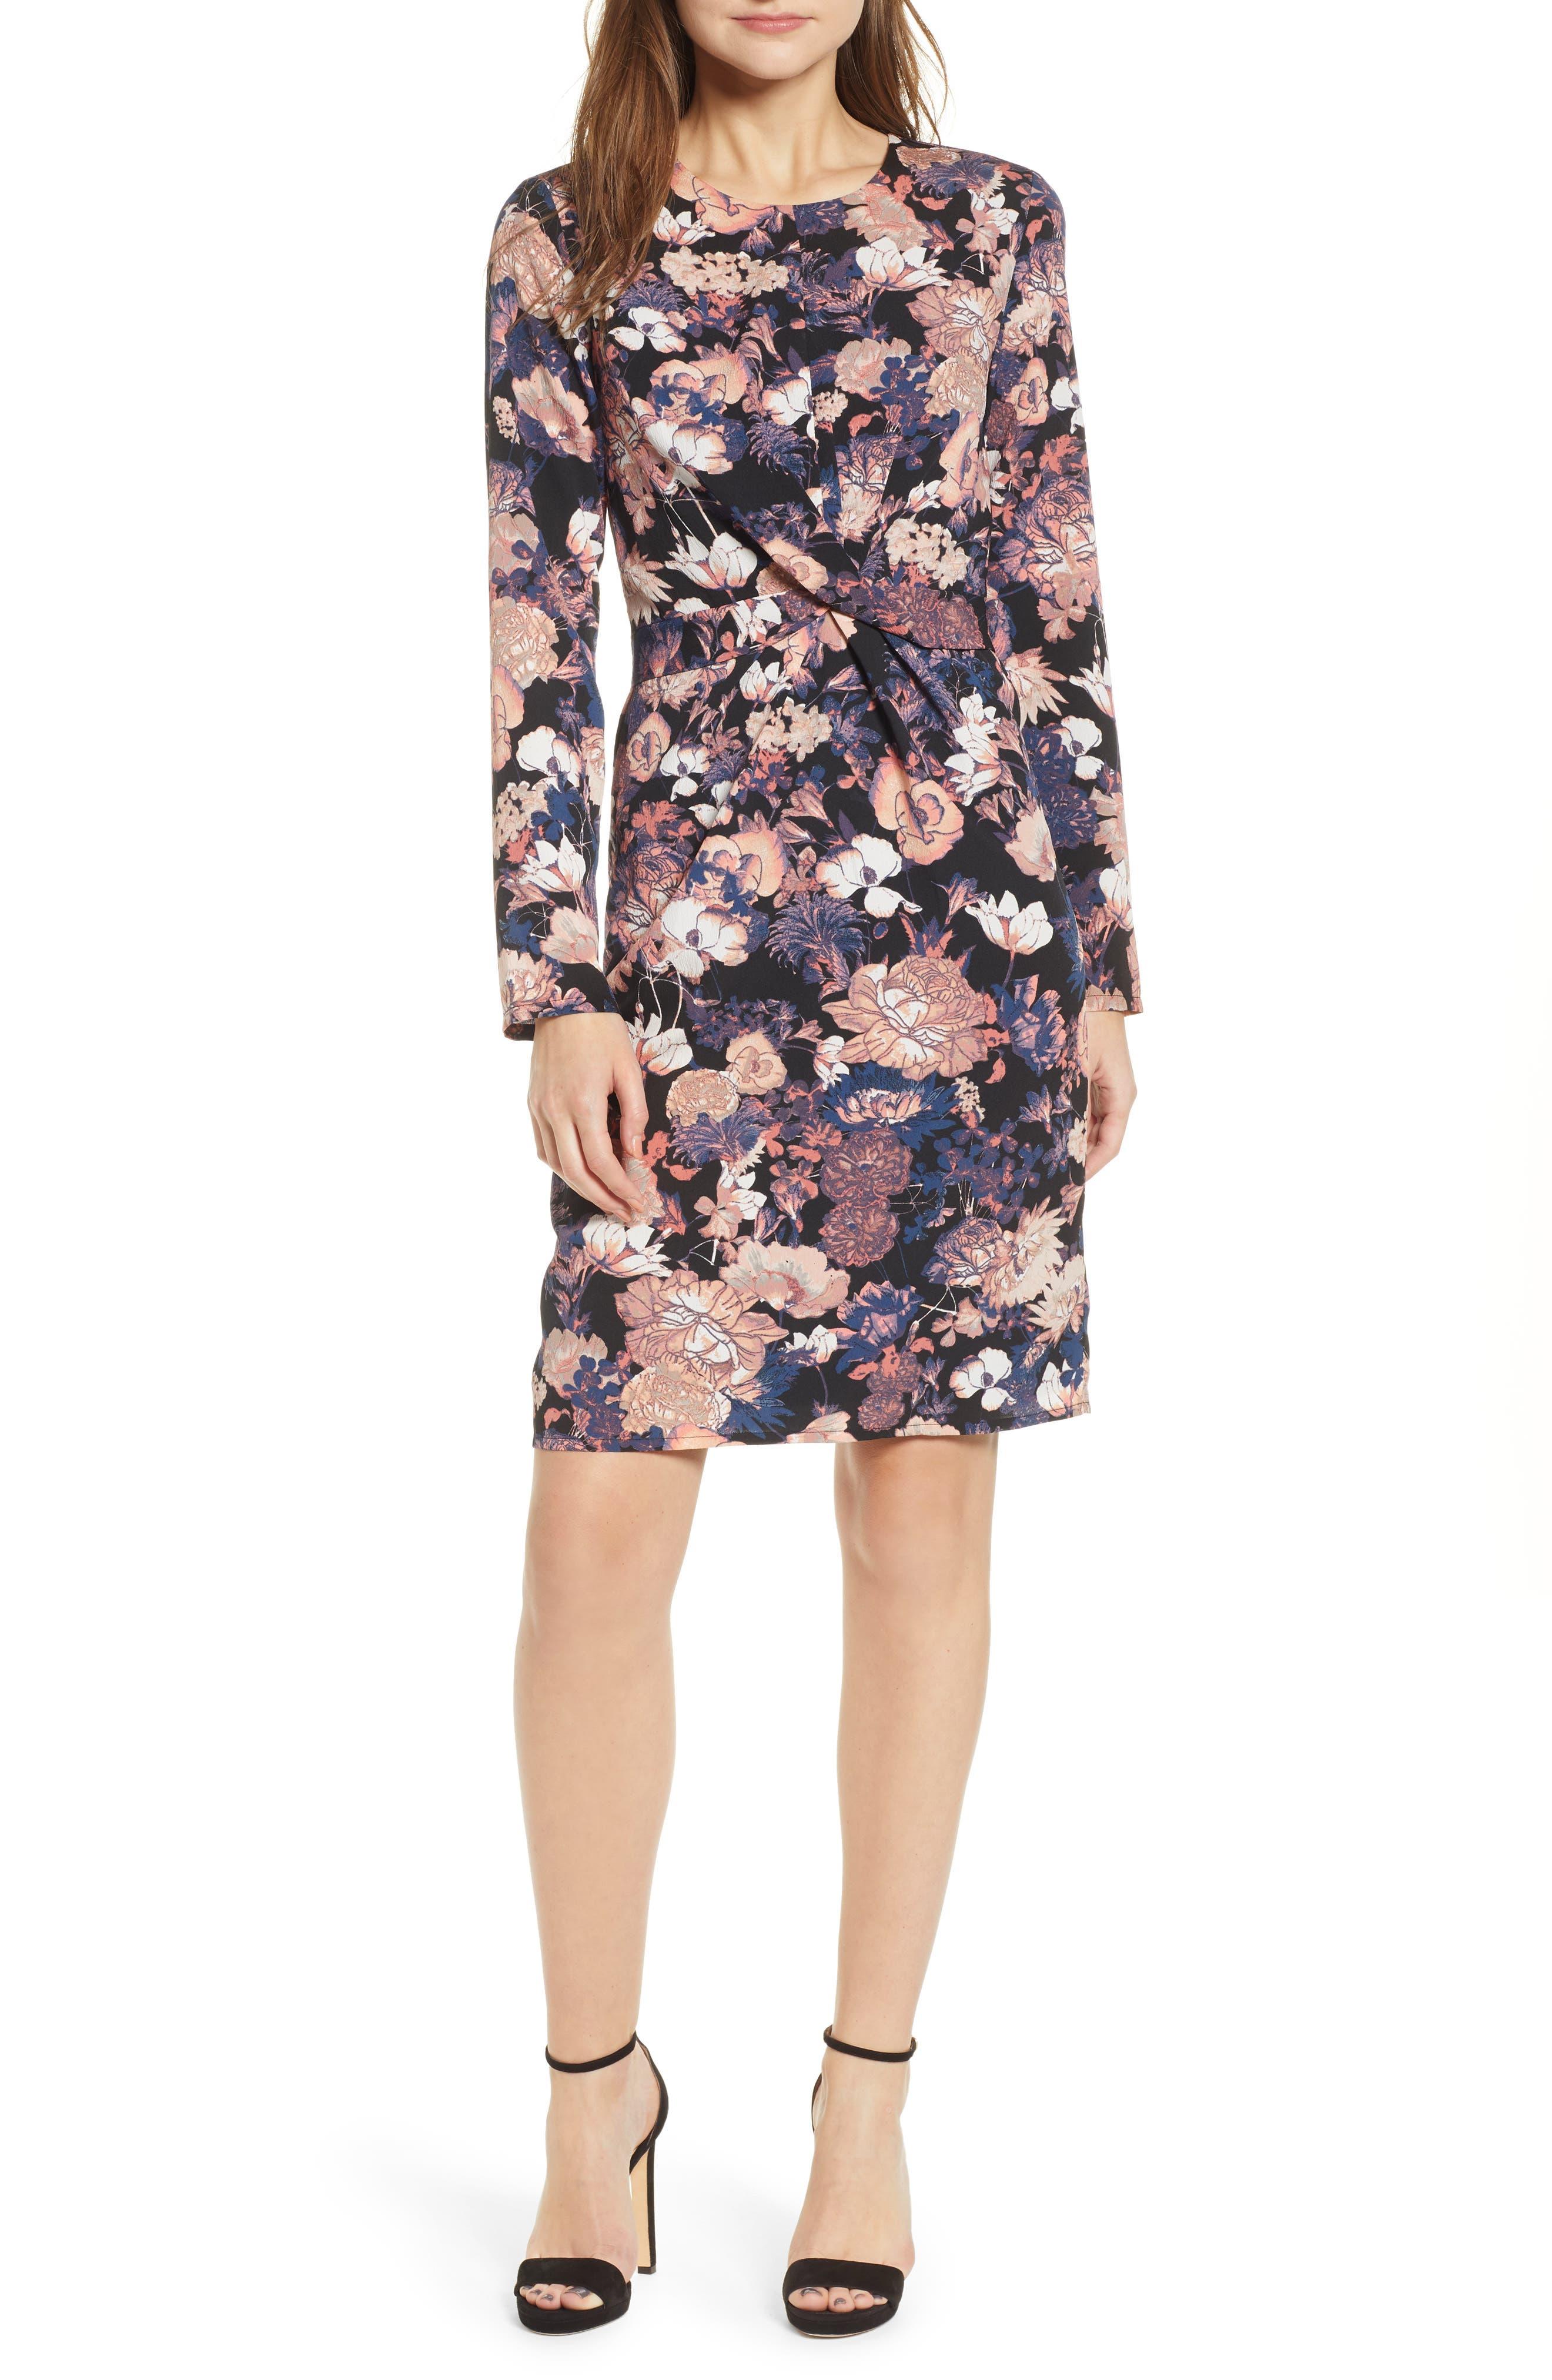 VERO MODA Marlene Floral Drape Dress, Main, color, BLACK PRINT